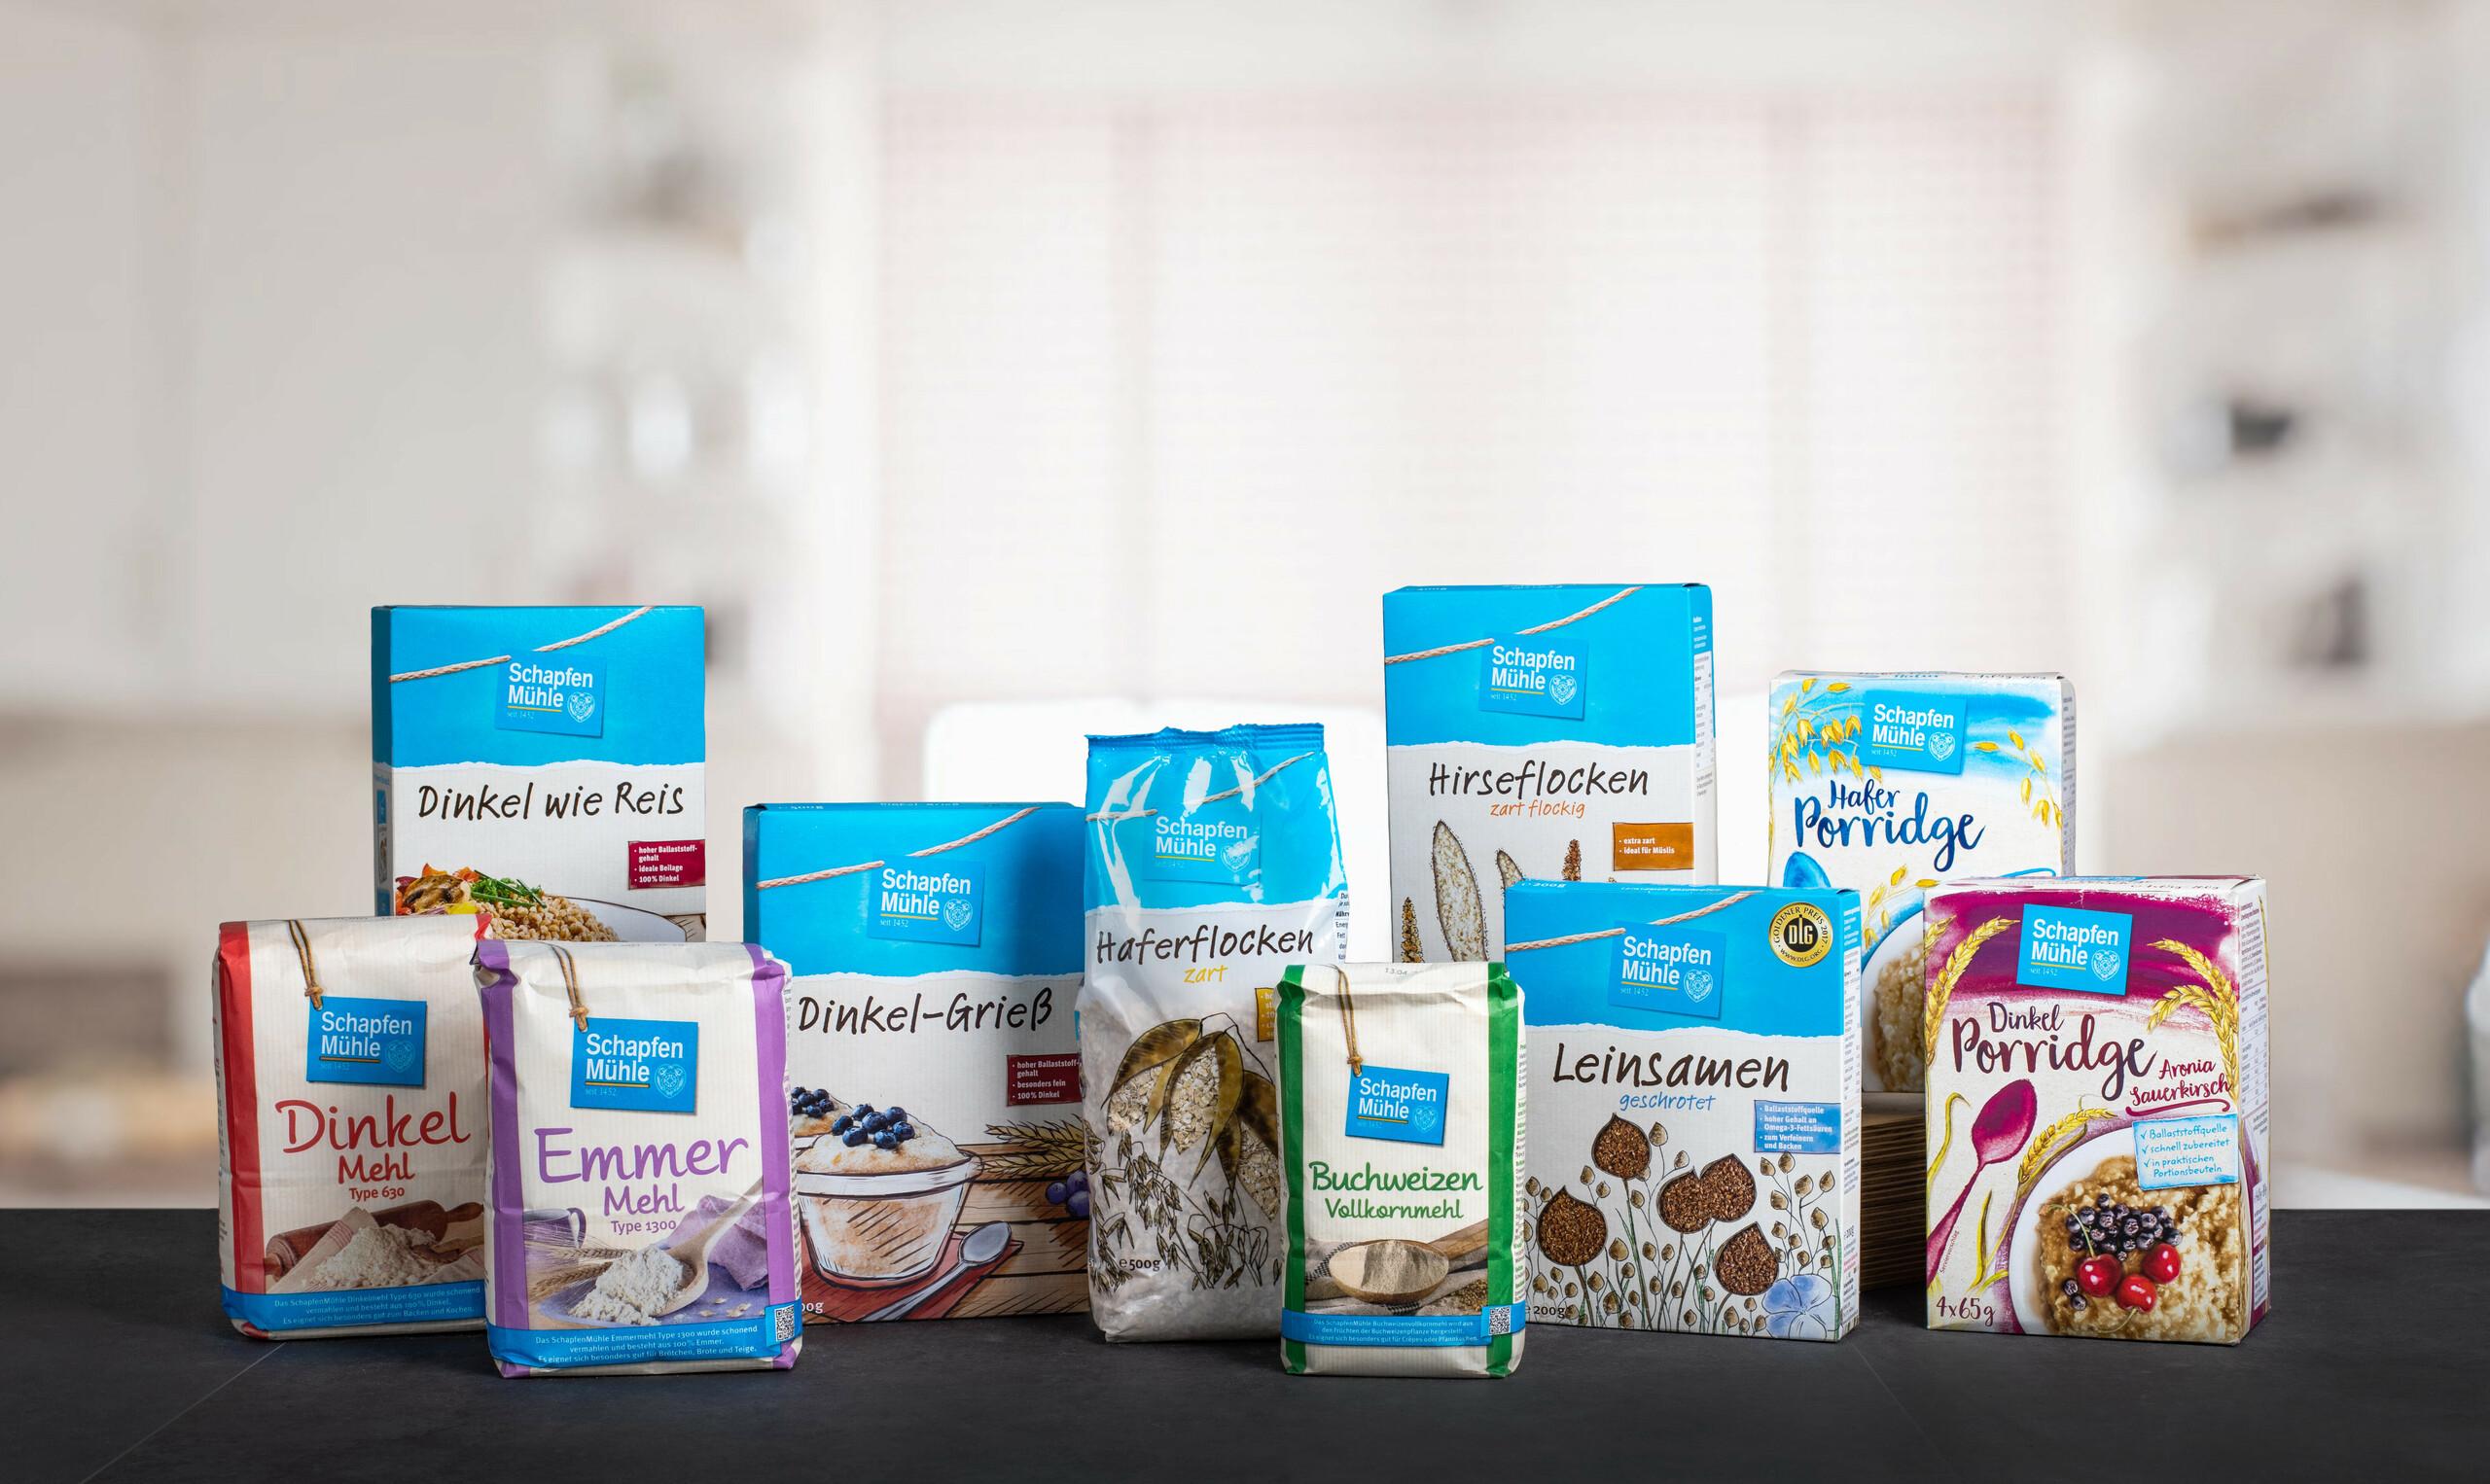 Picture product range SchapfenMühle